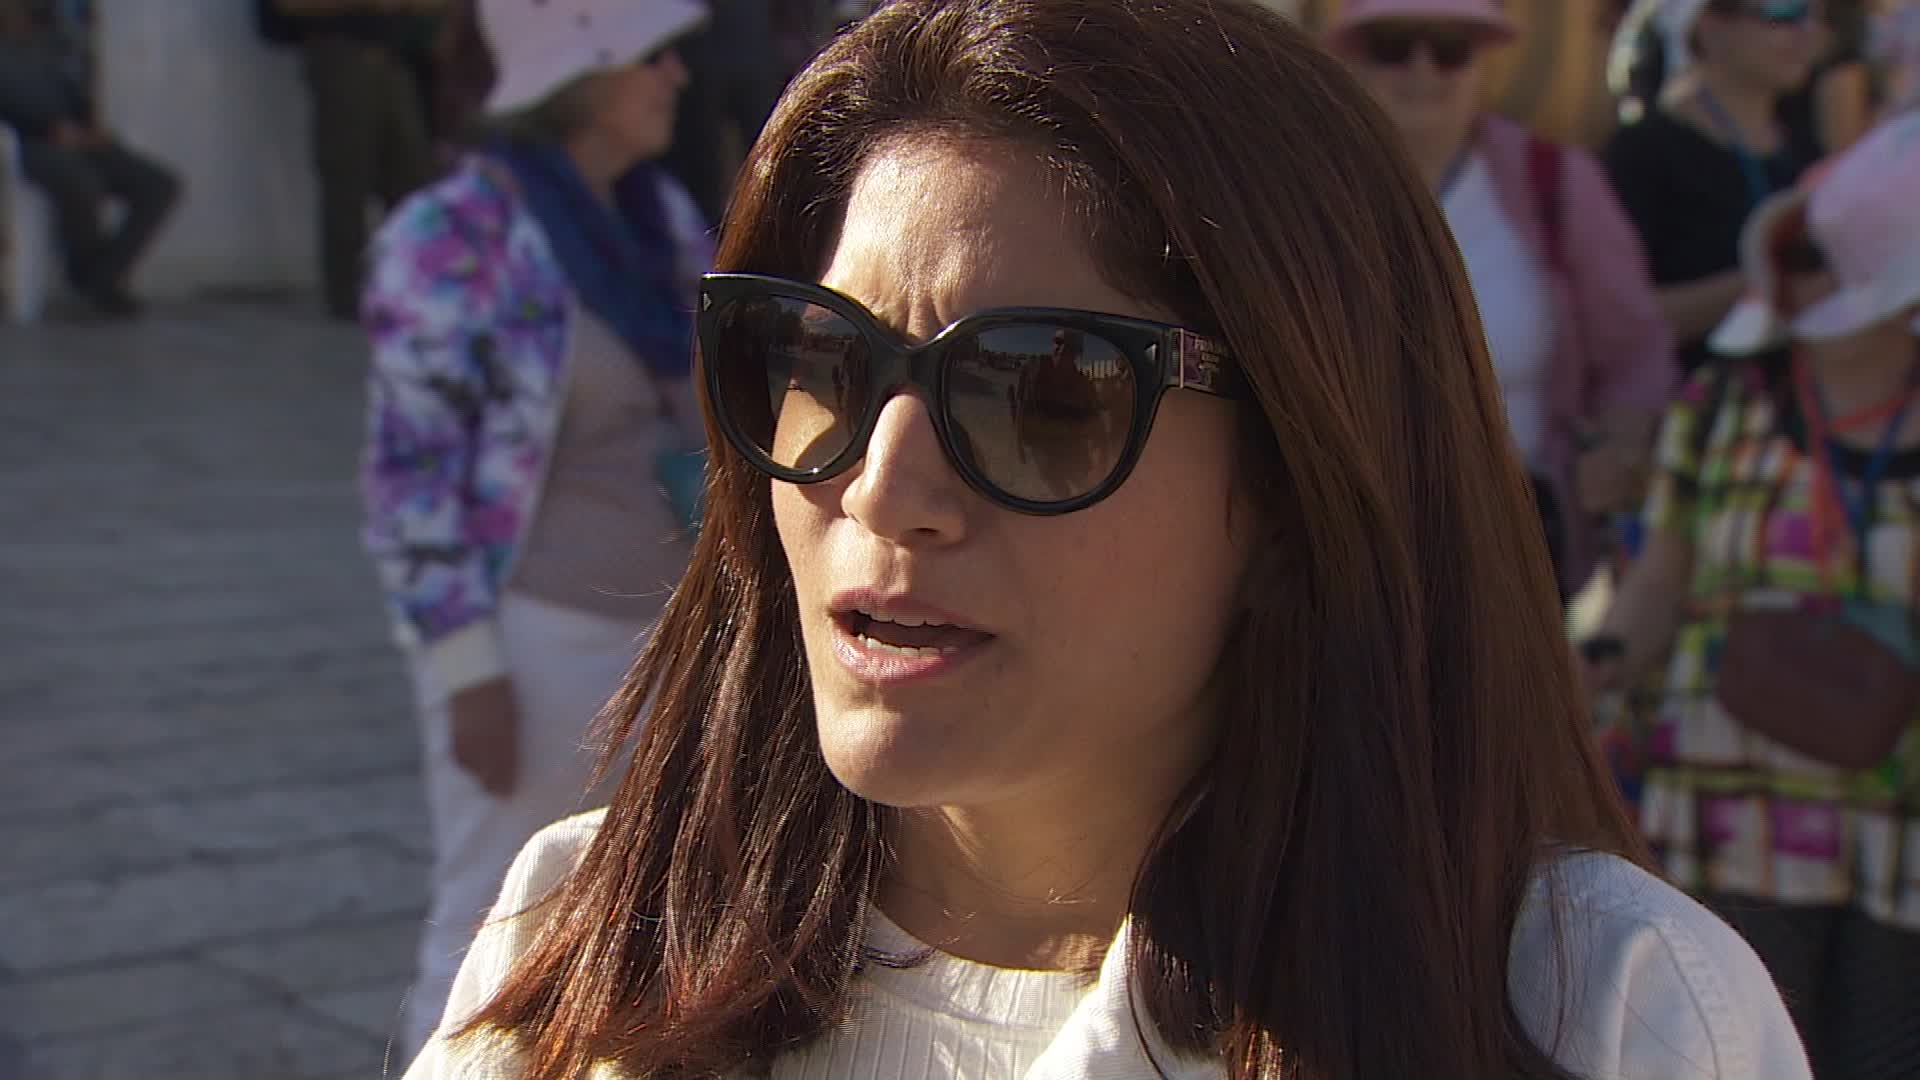 Yafit Dana, from Tel Aviv, Israel, spoke to CNN at Jerusalem's Western Wall on Sunday.